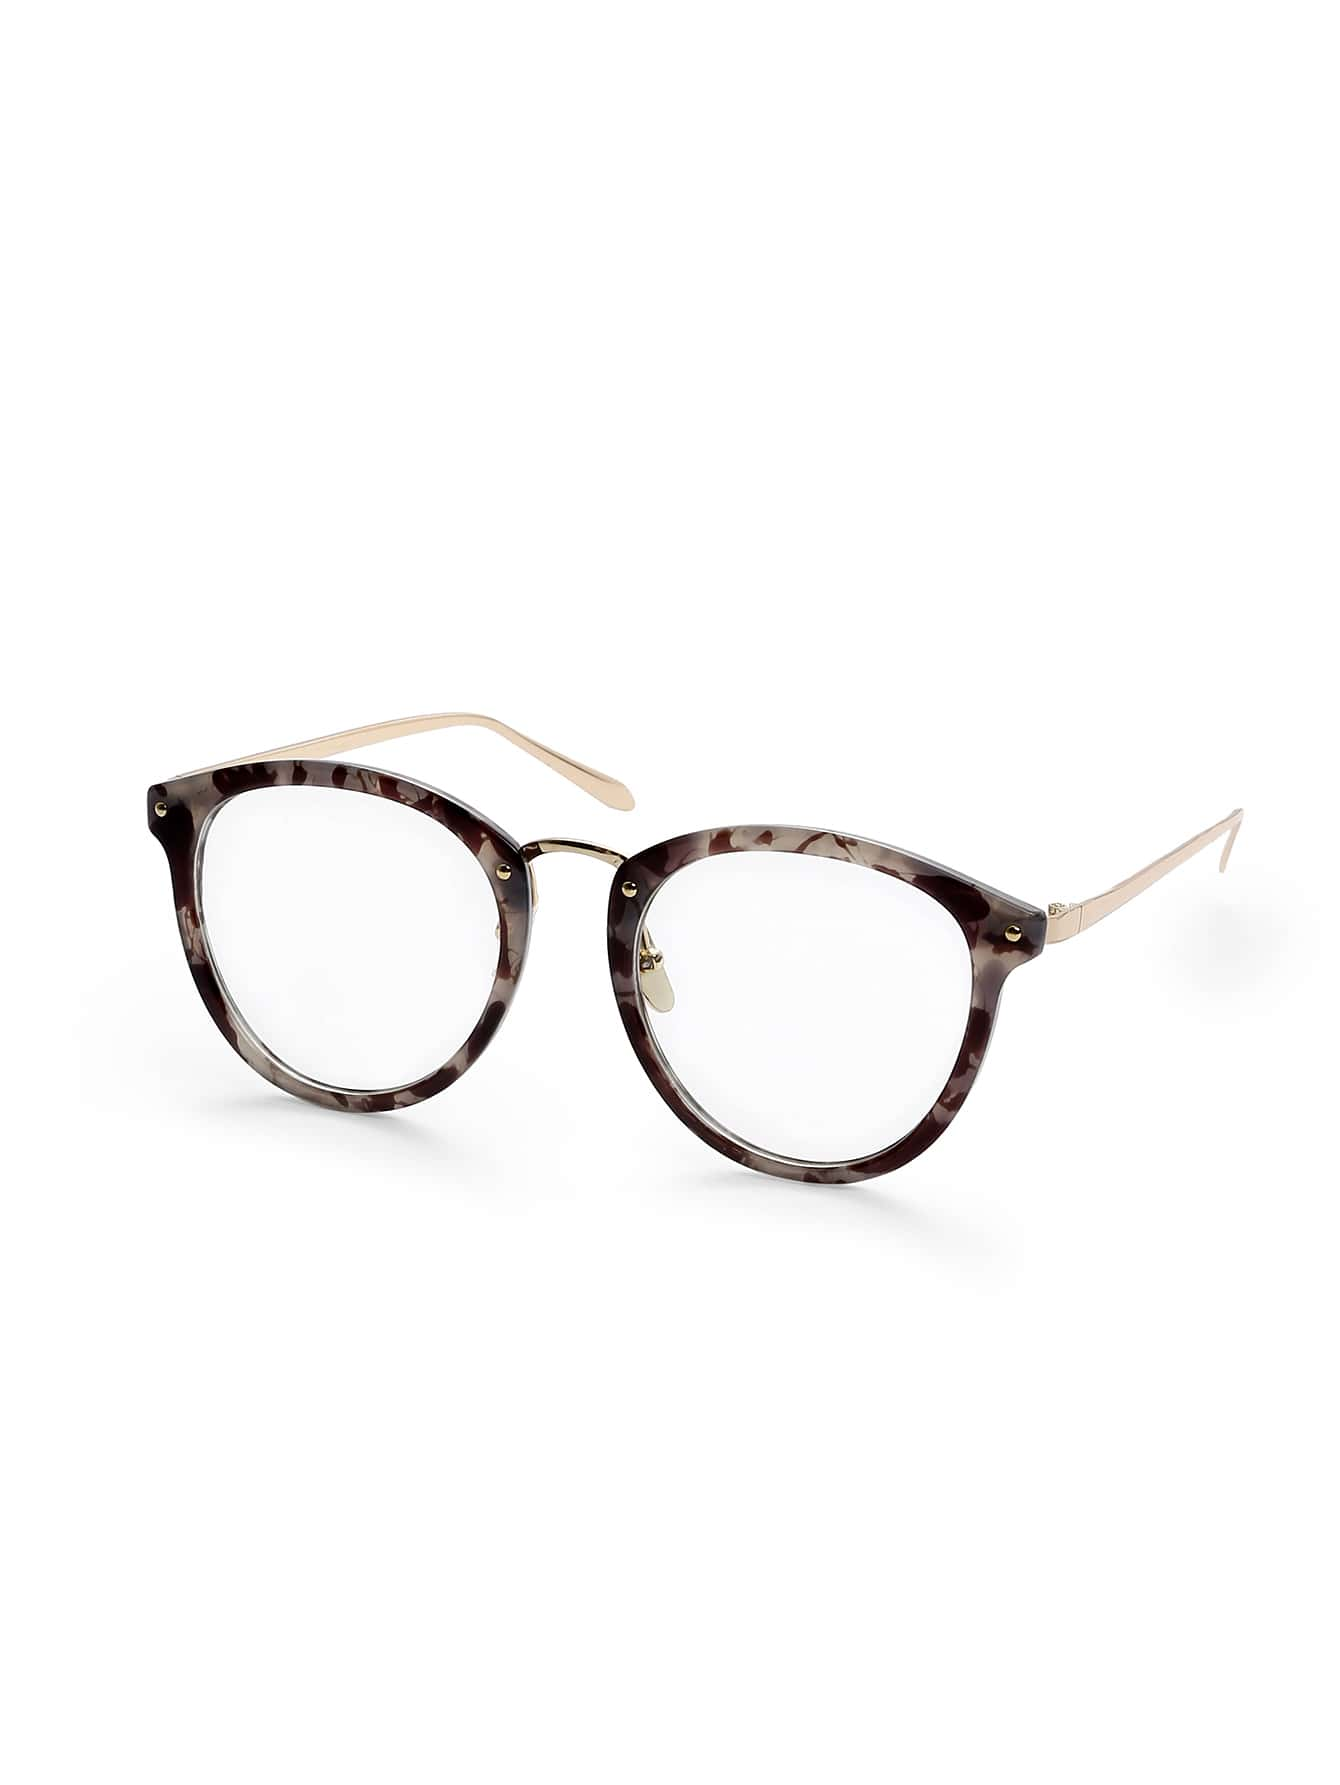 Grey Tortoise Frame Round Lens Glasses sunglass160802328